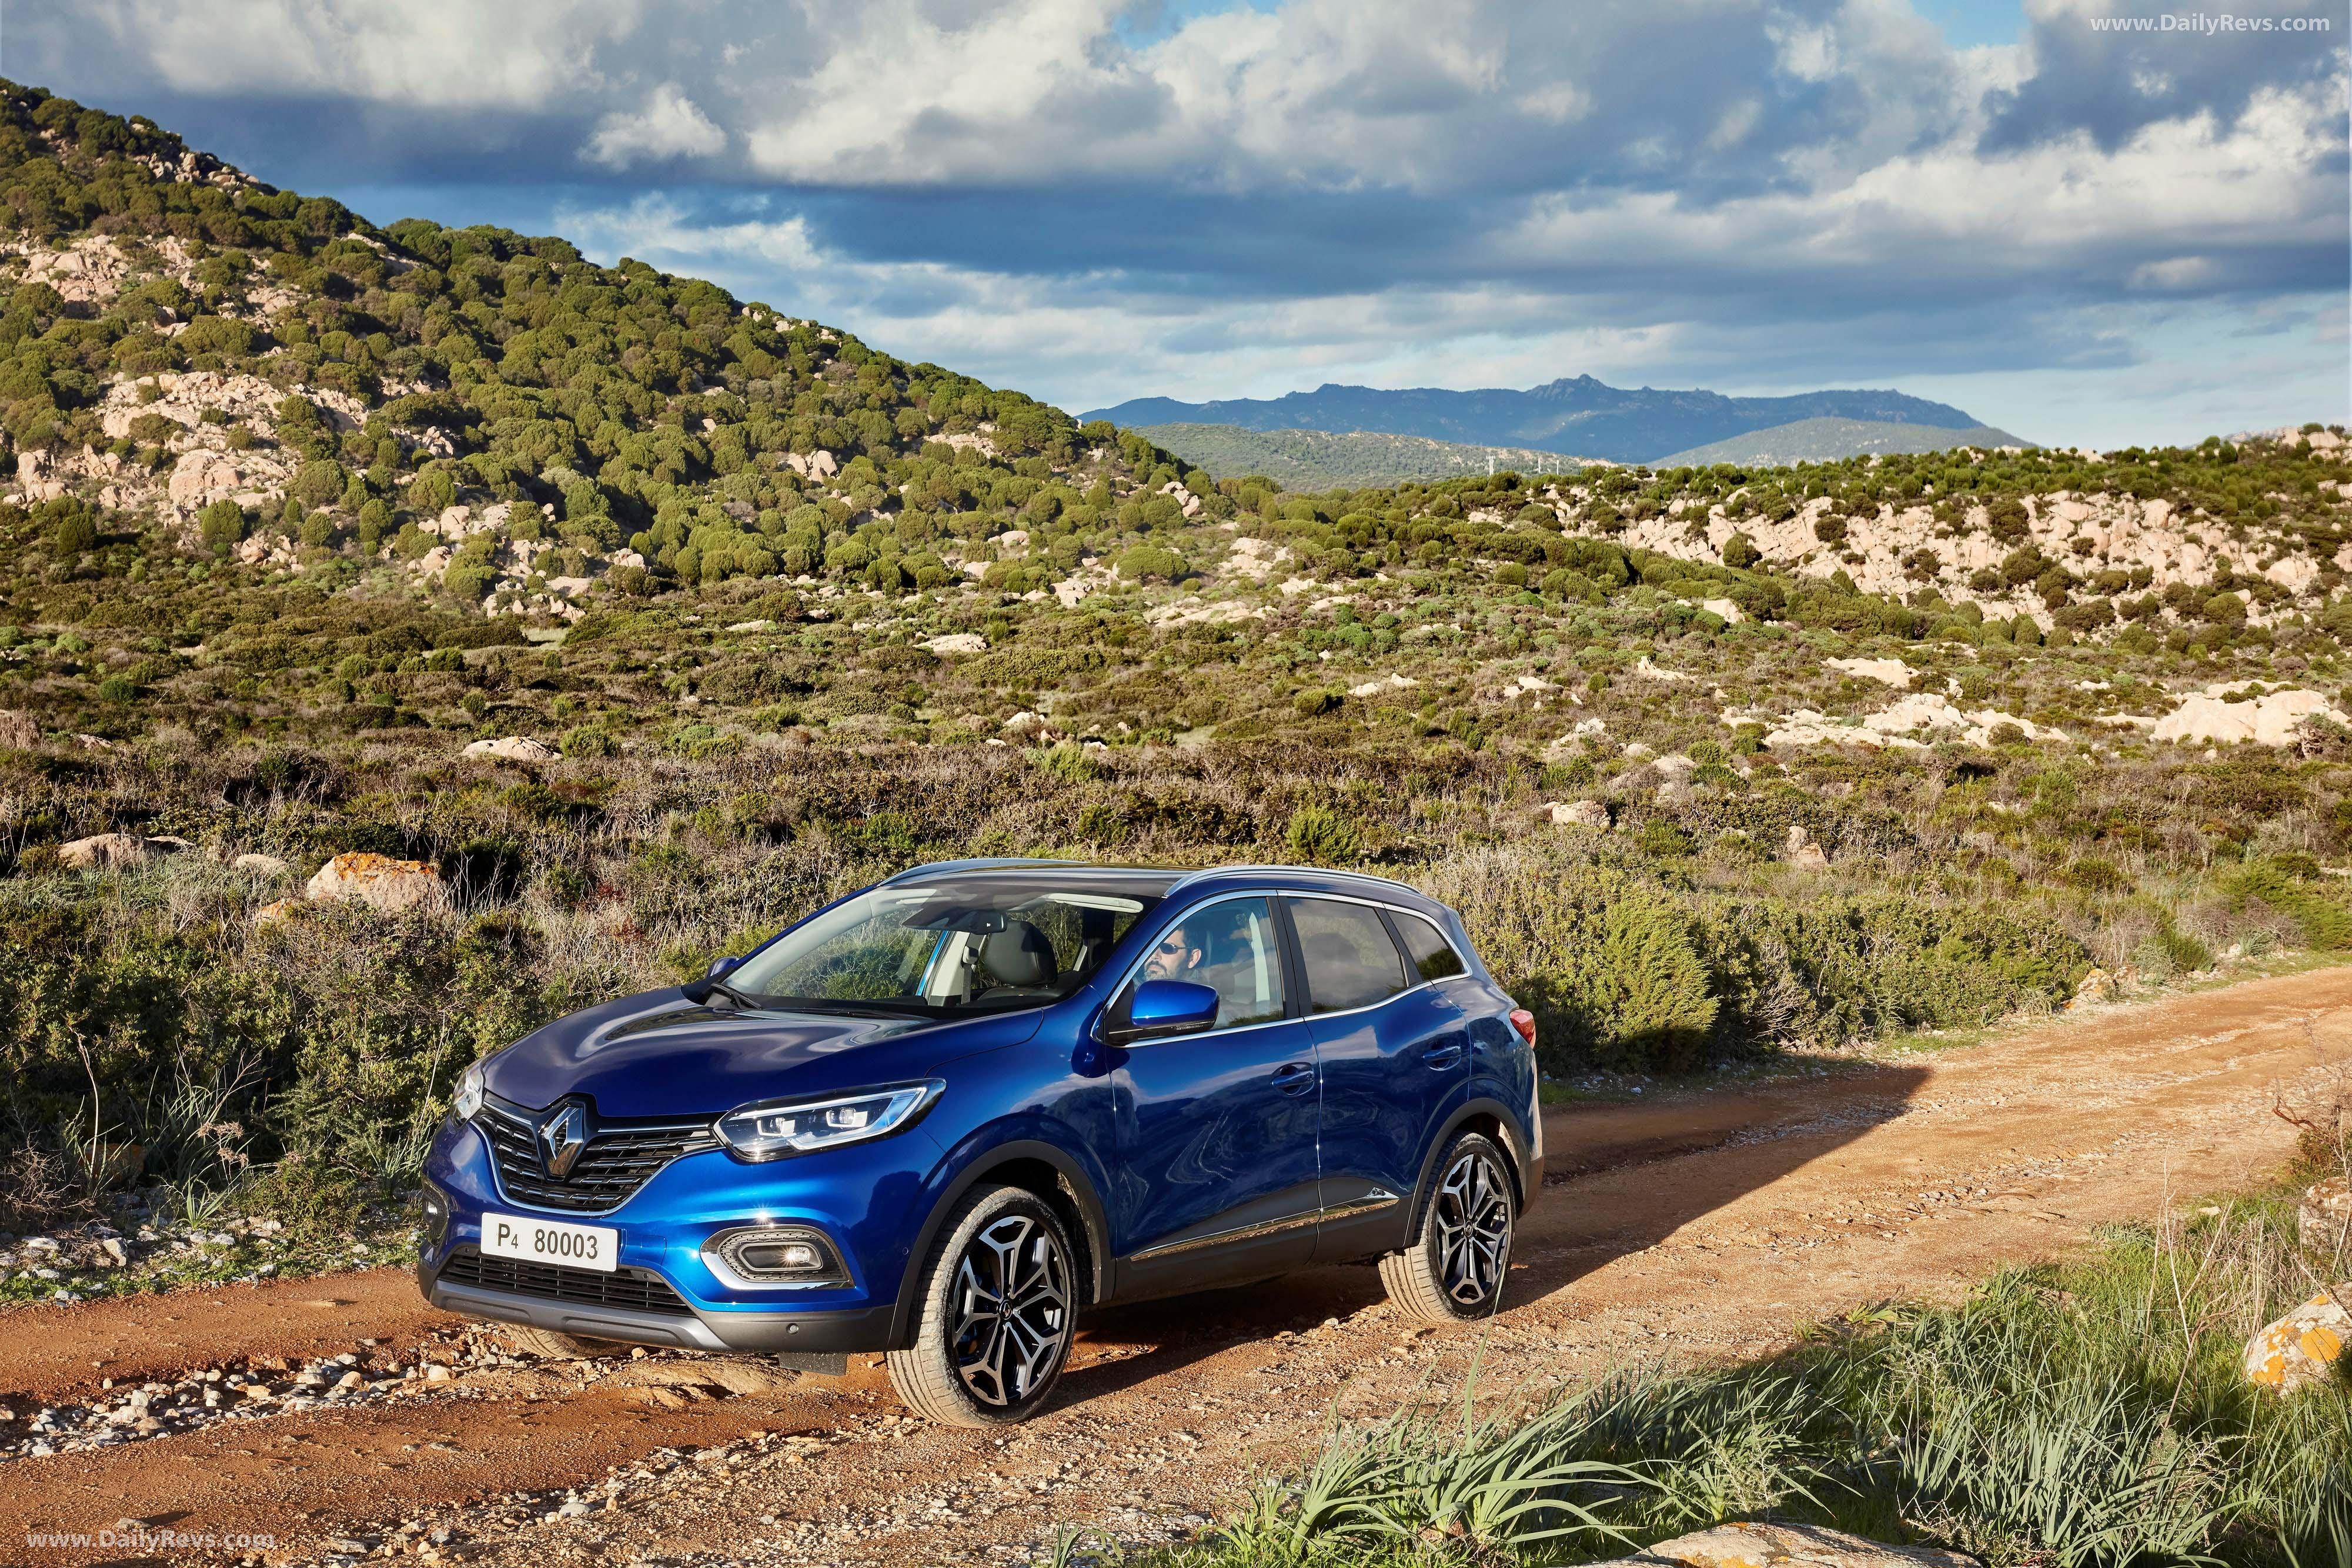 2019 Renault Kadjar full